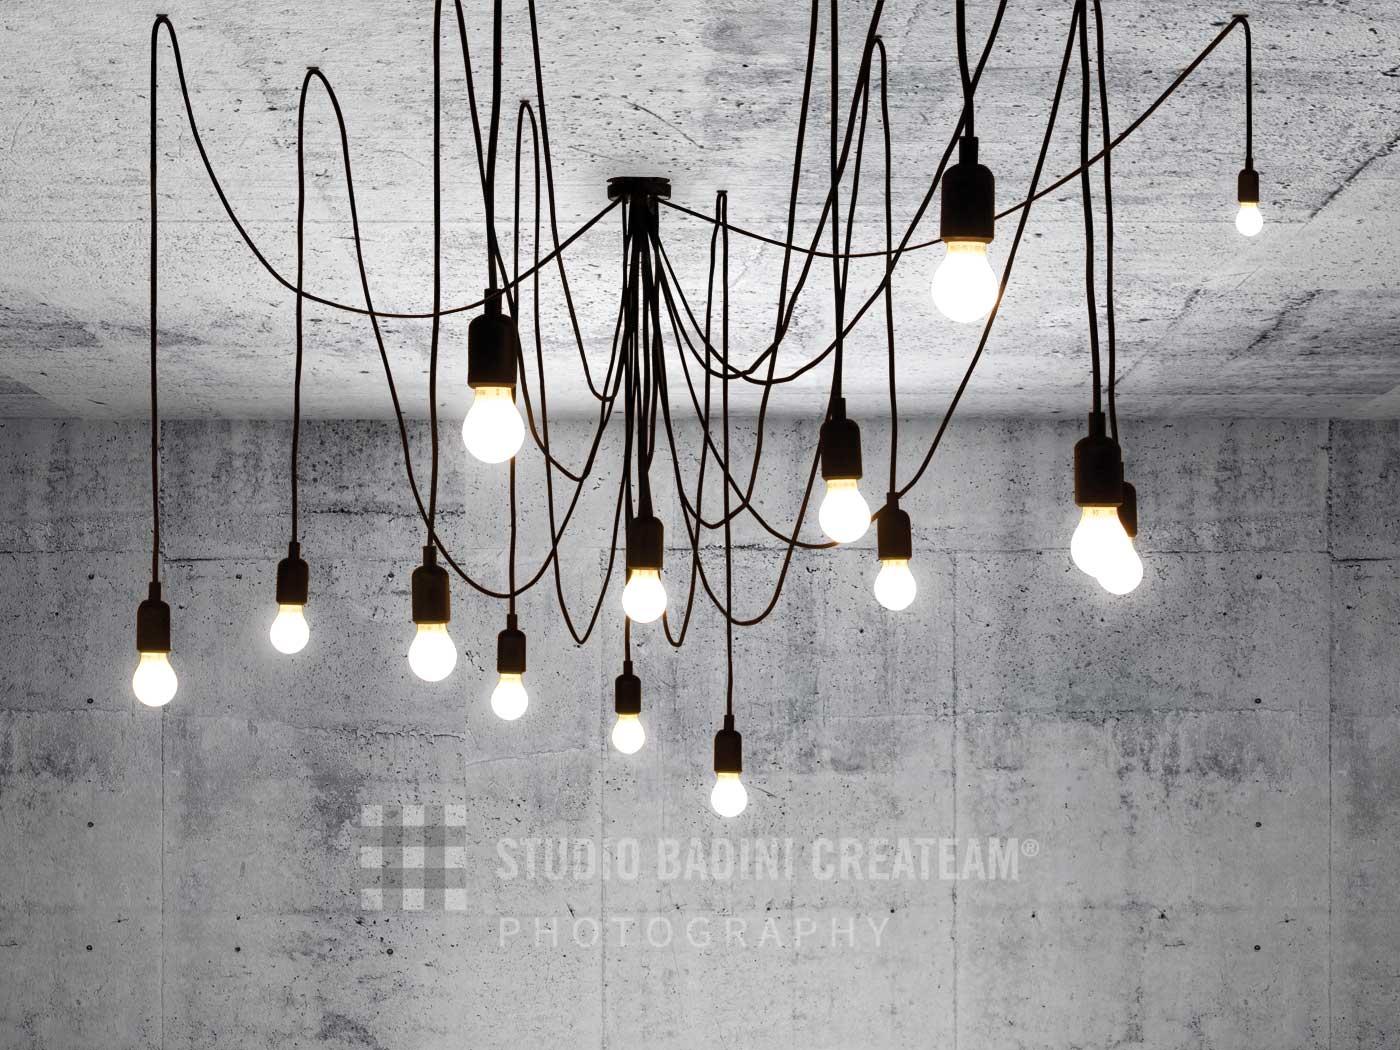 Badini Creative Studio - fotografia - seletti - maman